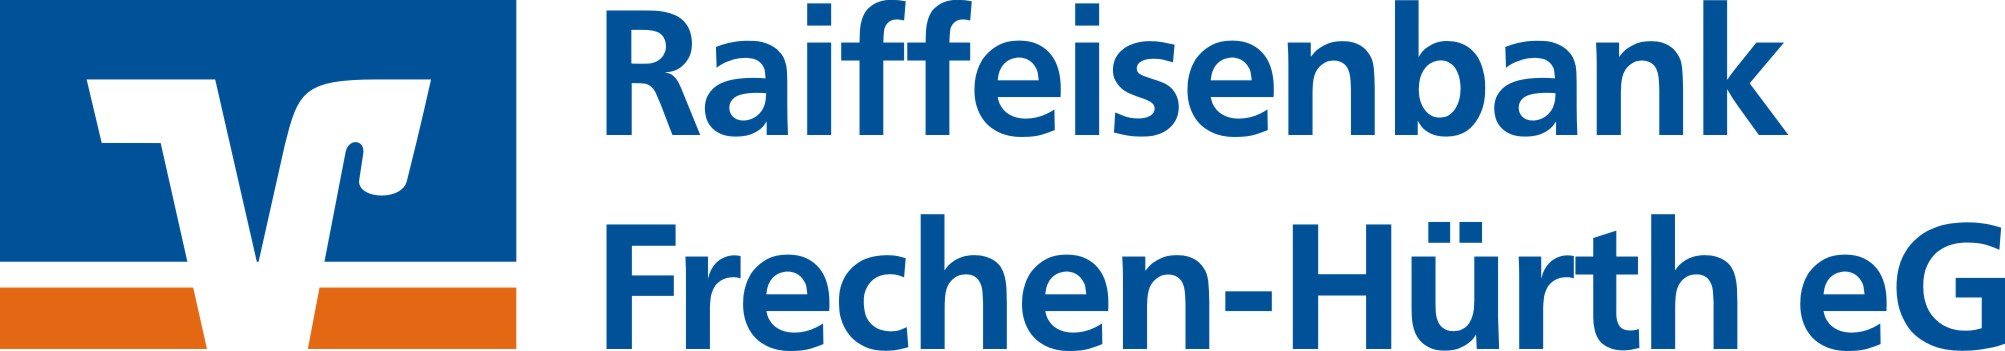 Raiffeisenbank Frechen-Hürth eG, Selbstbedienungs-Filiale Weidenpesch